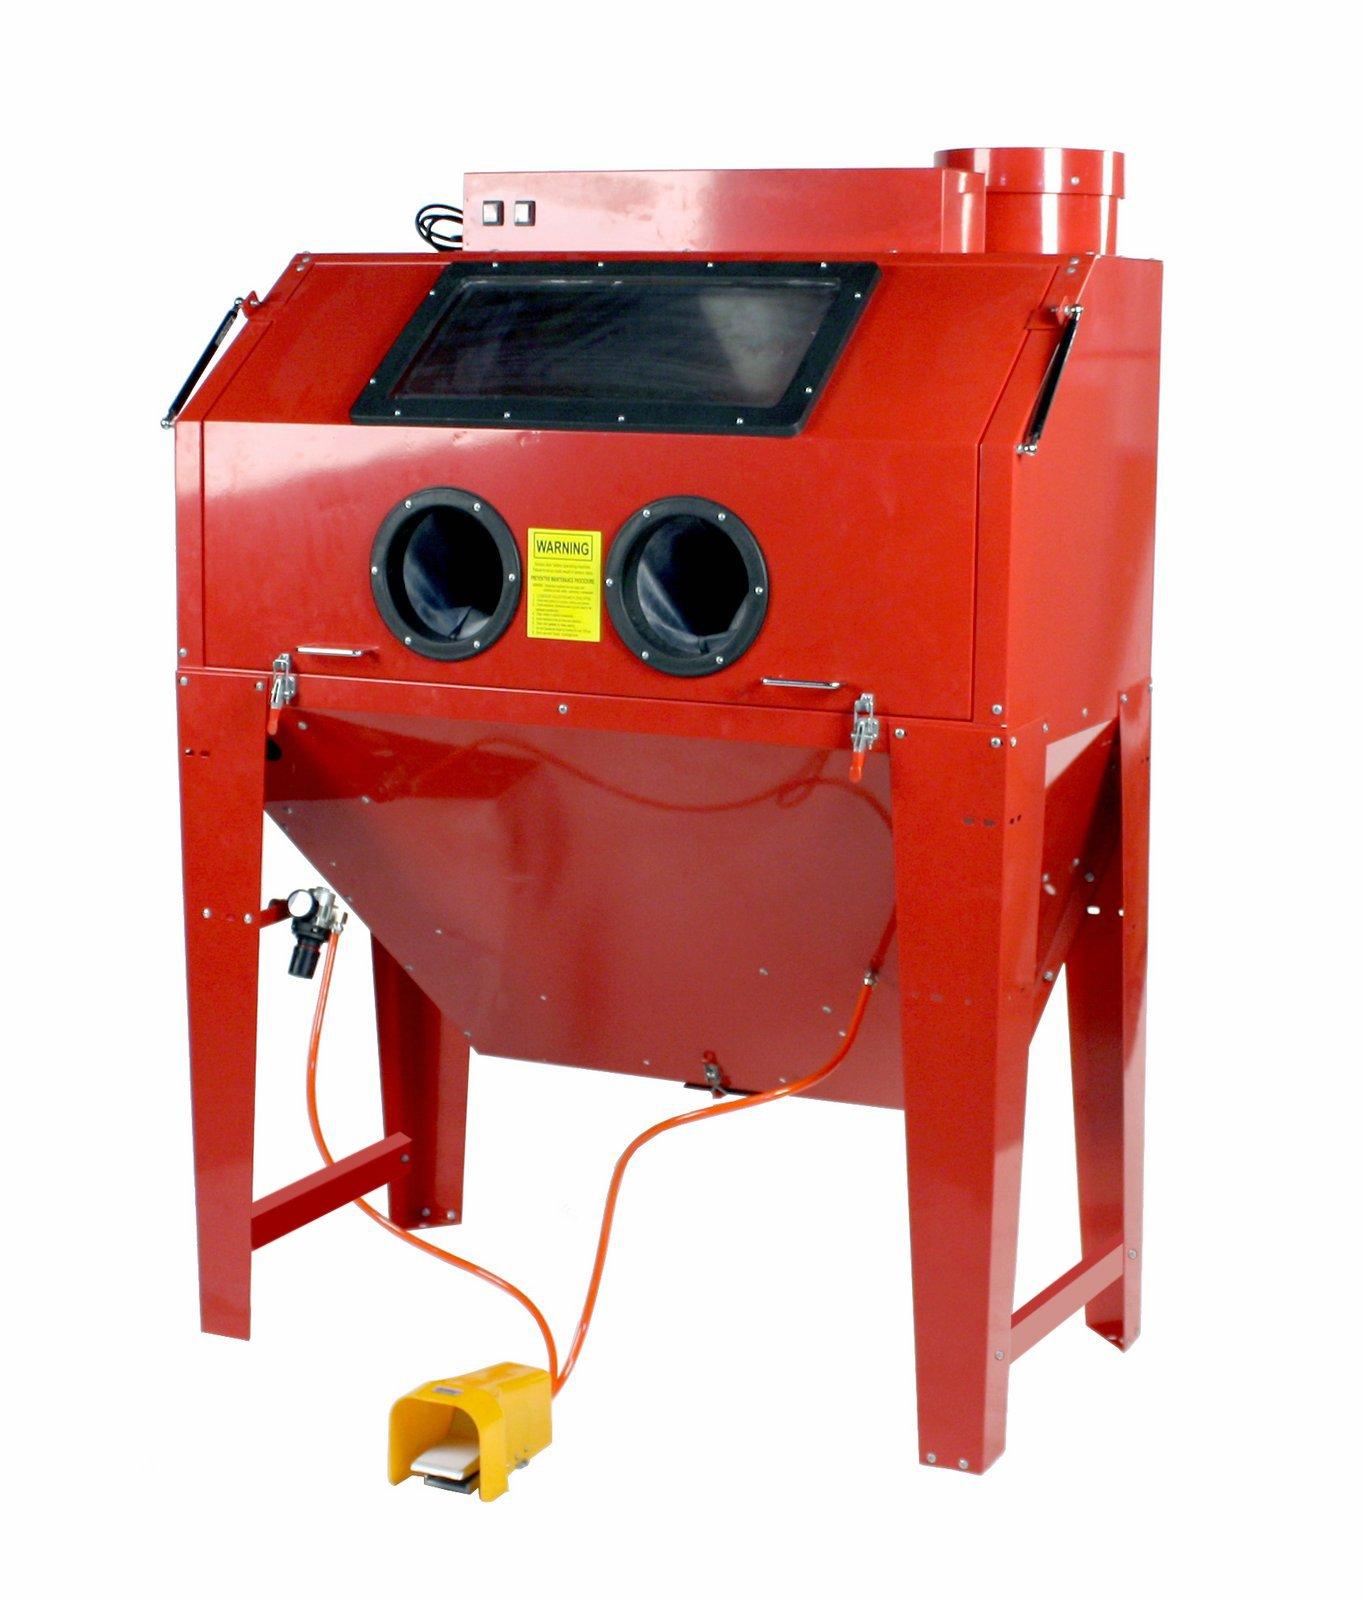 Dragway Tools Model 110 Sandblast Sandblasting Cabinet & Built In Dust Collector